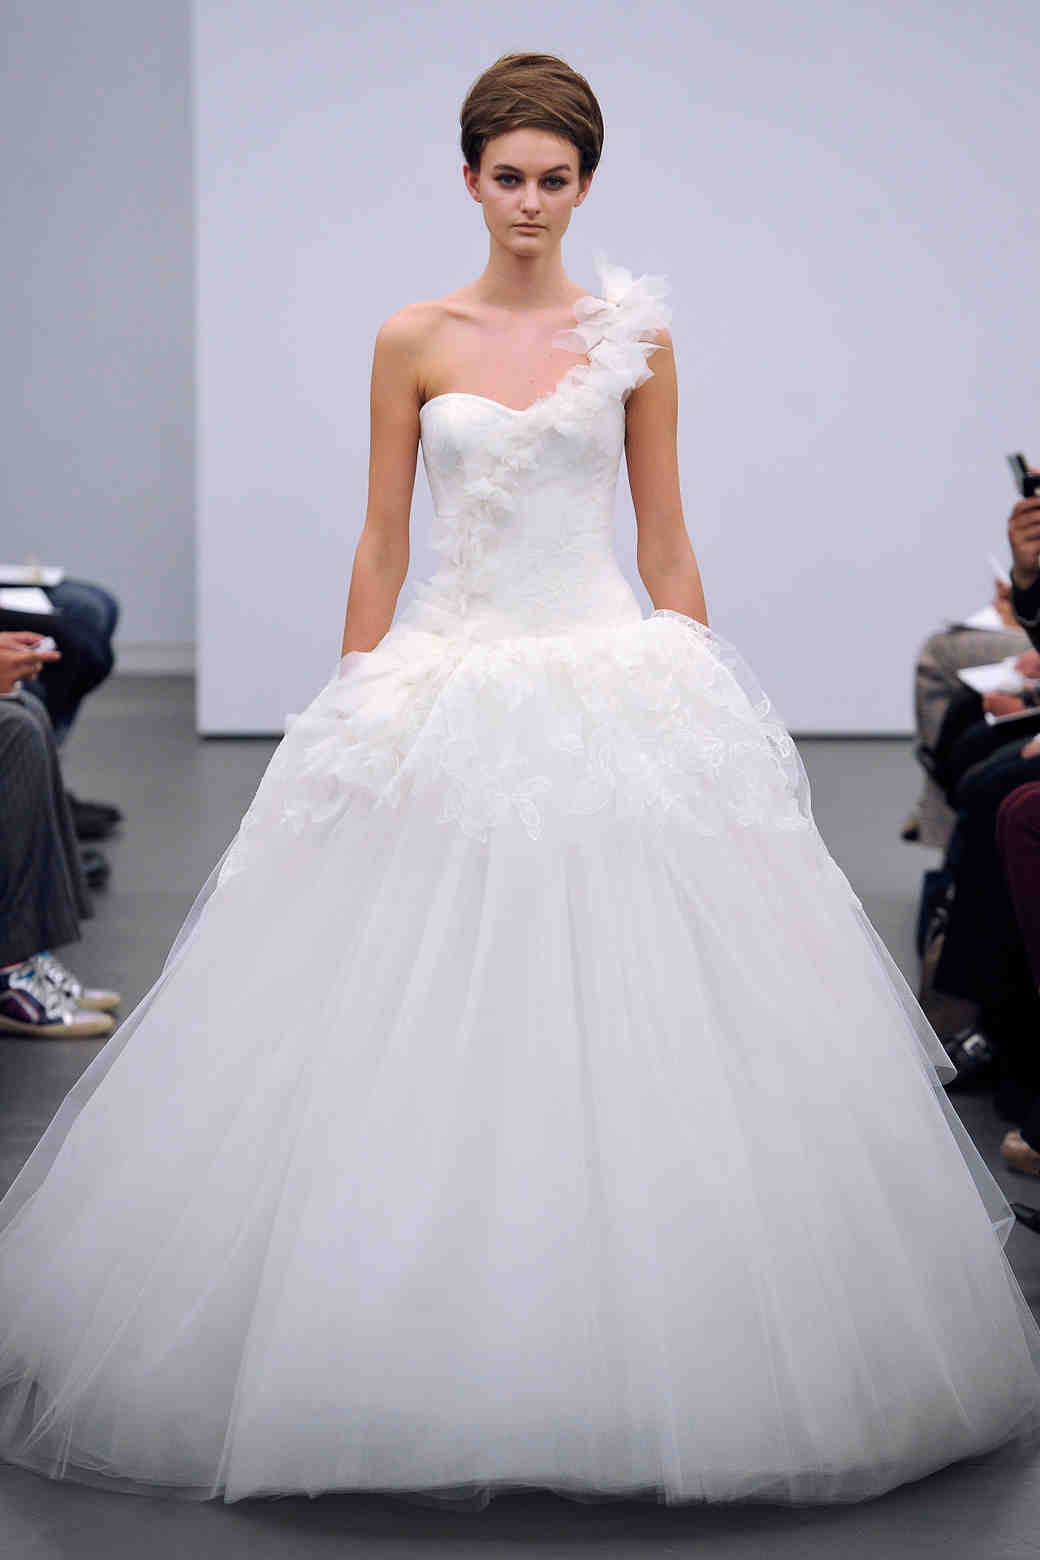 3e4c801e54de One-Shoulder Wedding Dresses, Fall 2013 | Martha Stewart Weddings